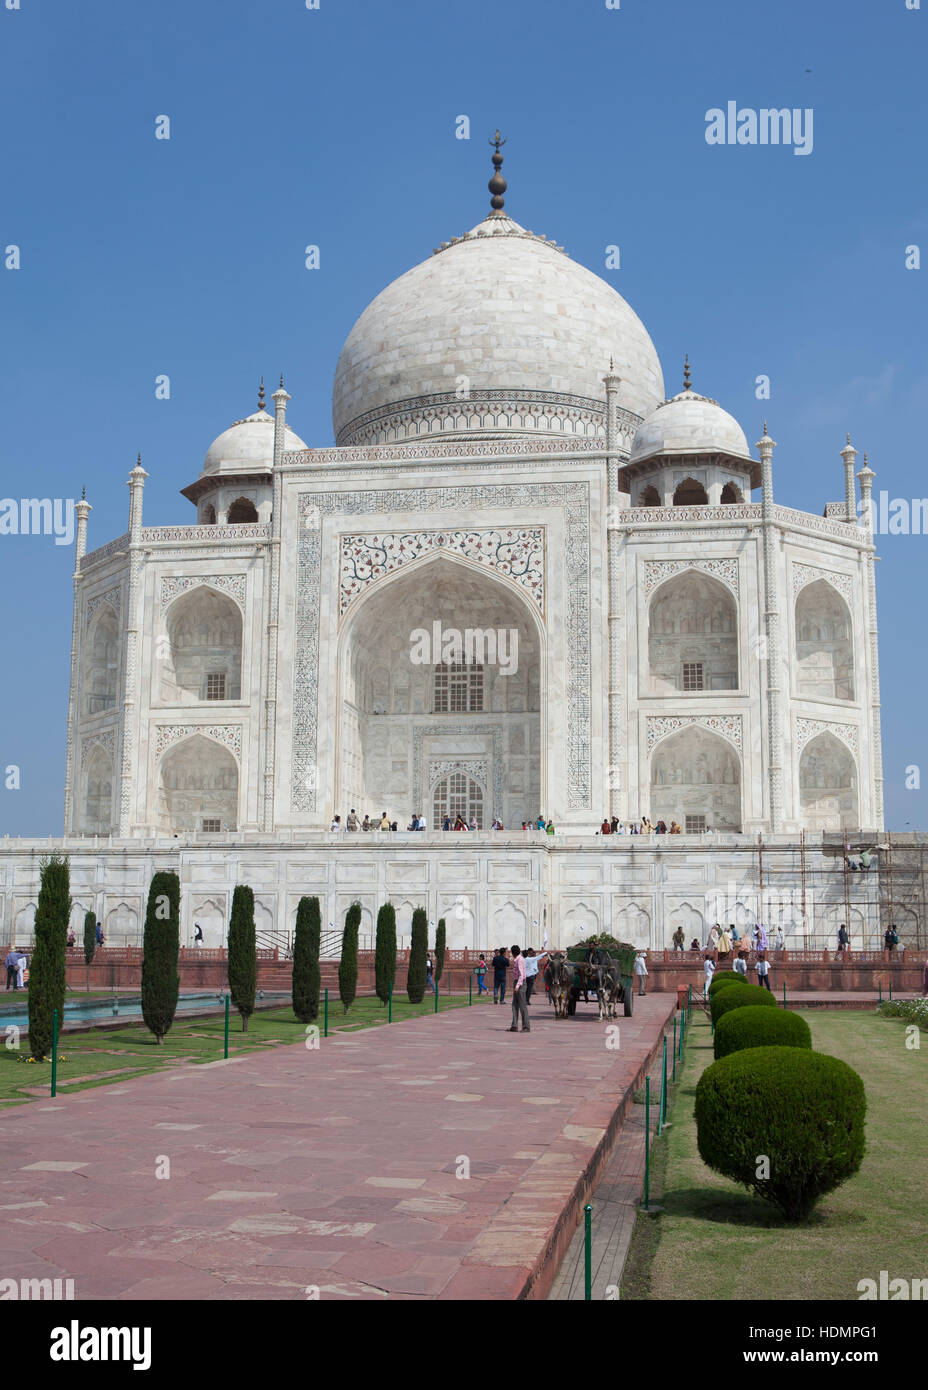 El mausoleo de Taj Mahal, sur de ver ,de Uttar Pradesh, India Imagen De Stock